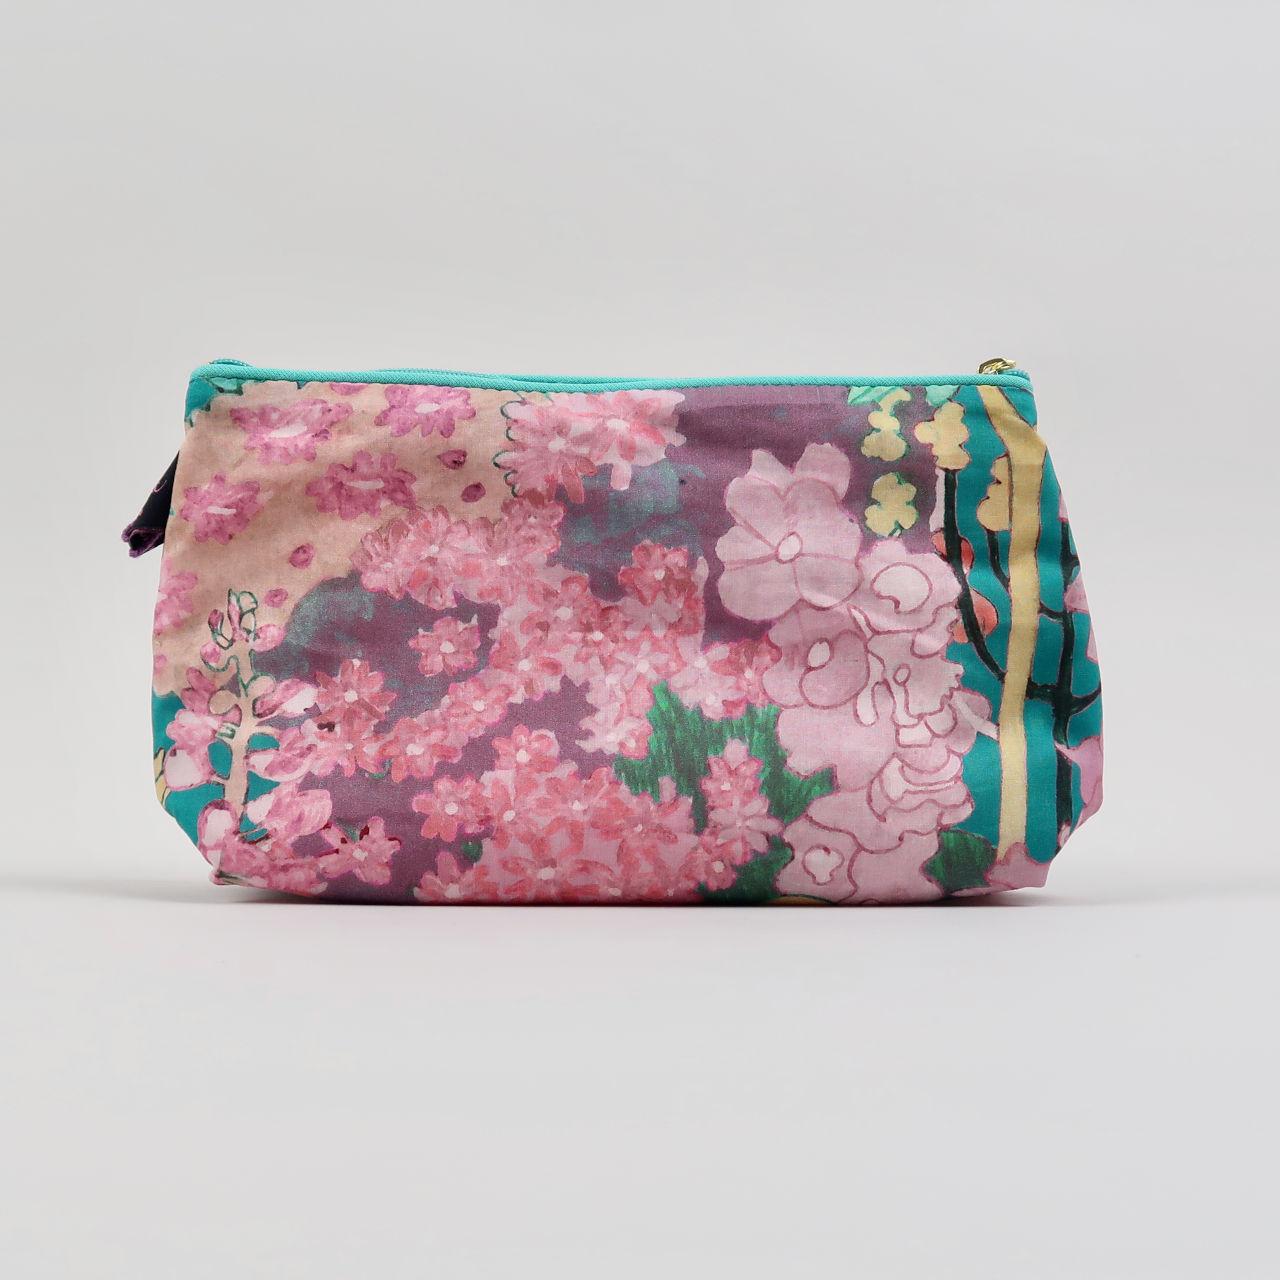 Liberty Print Cosmetic Bag - Anna's Garden Teal